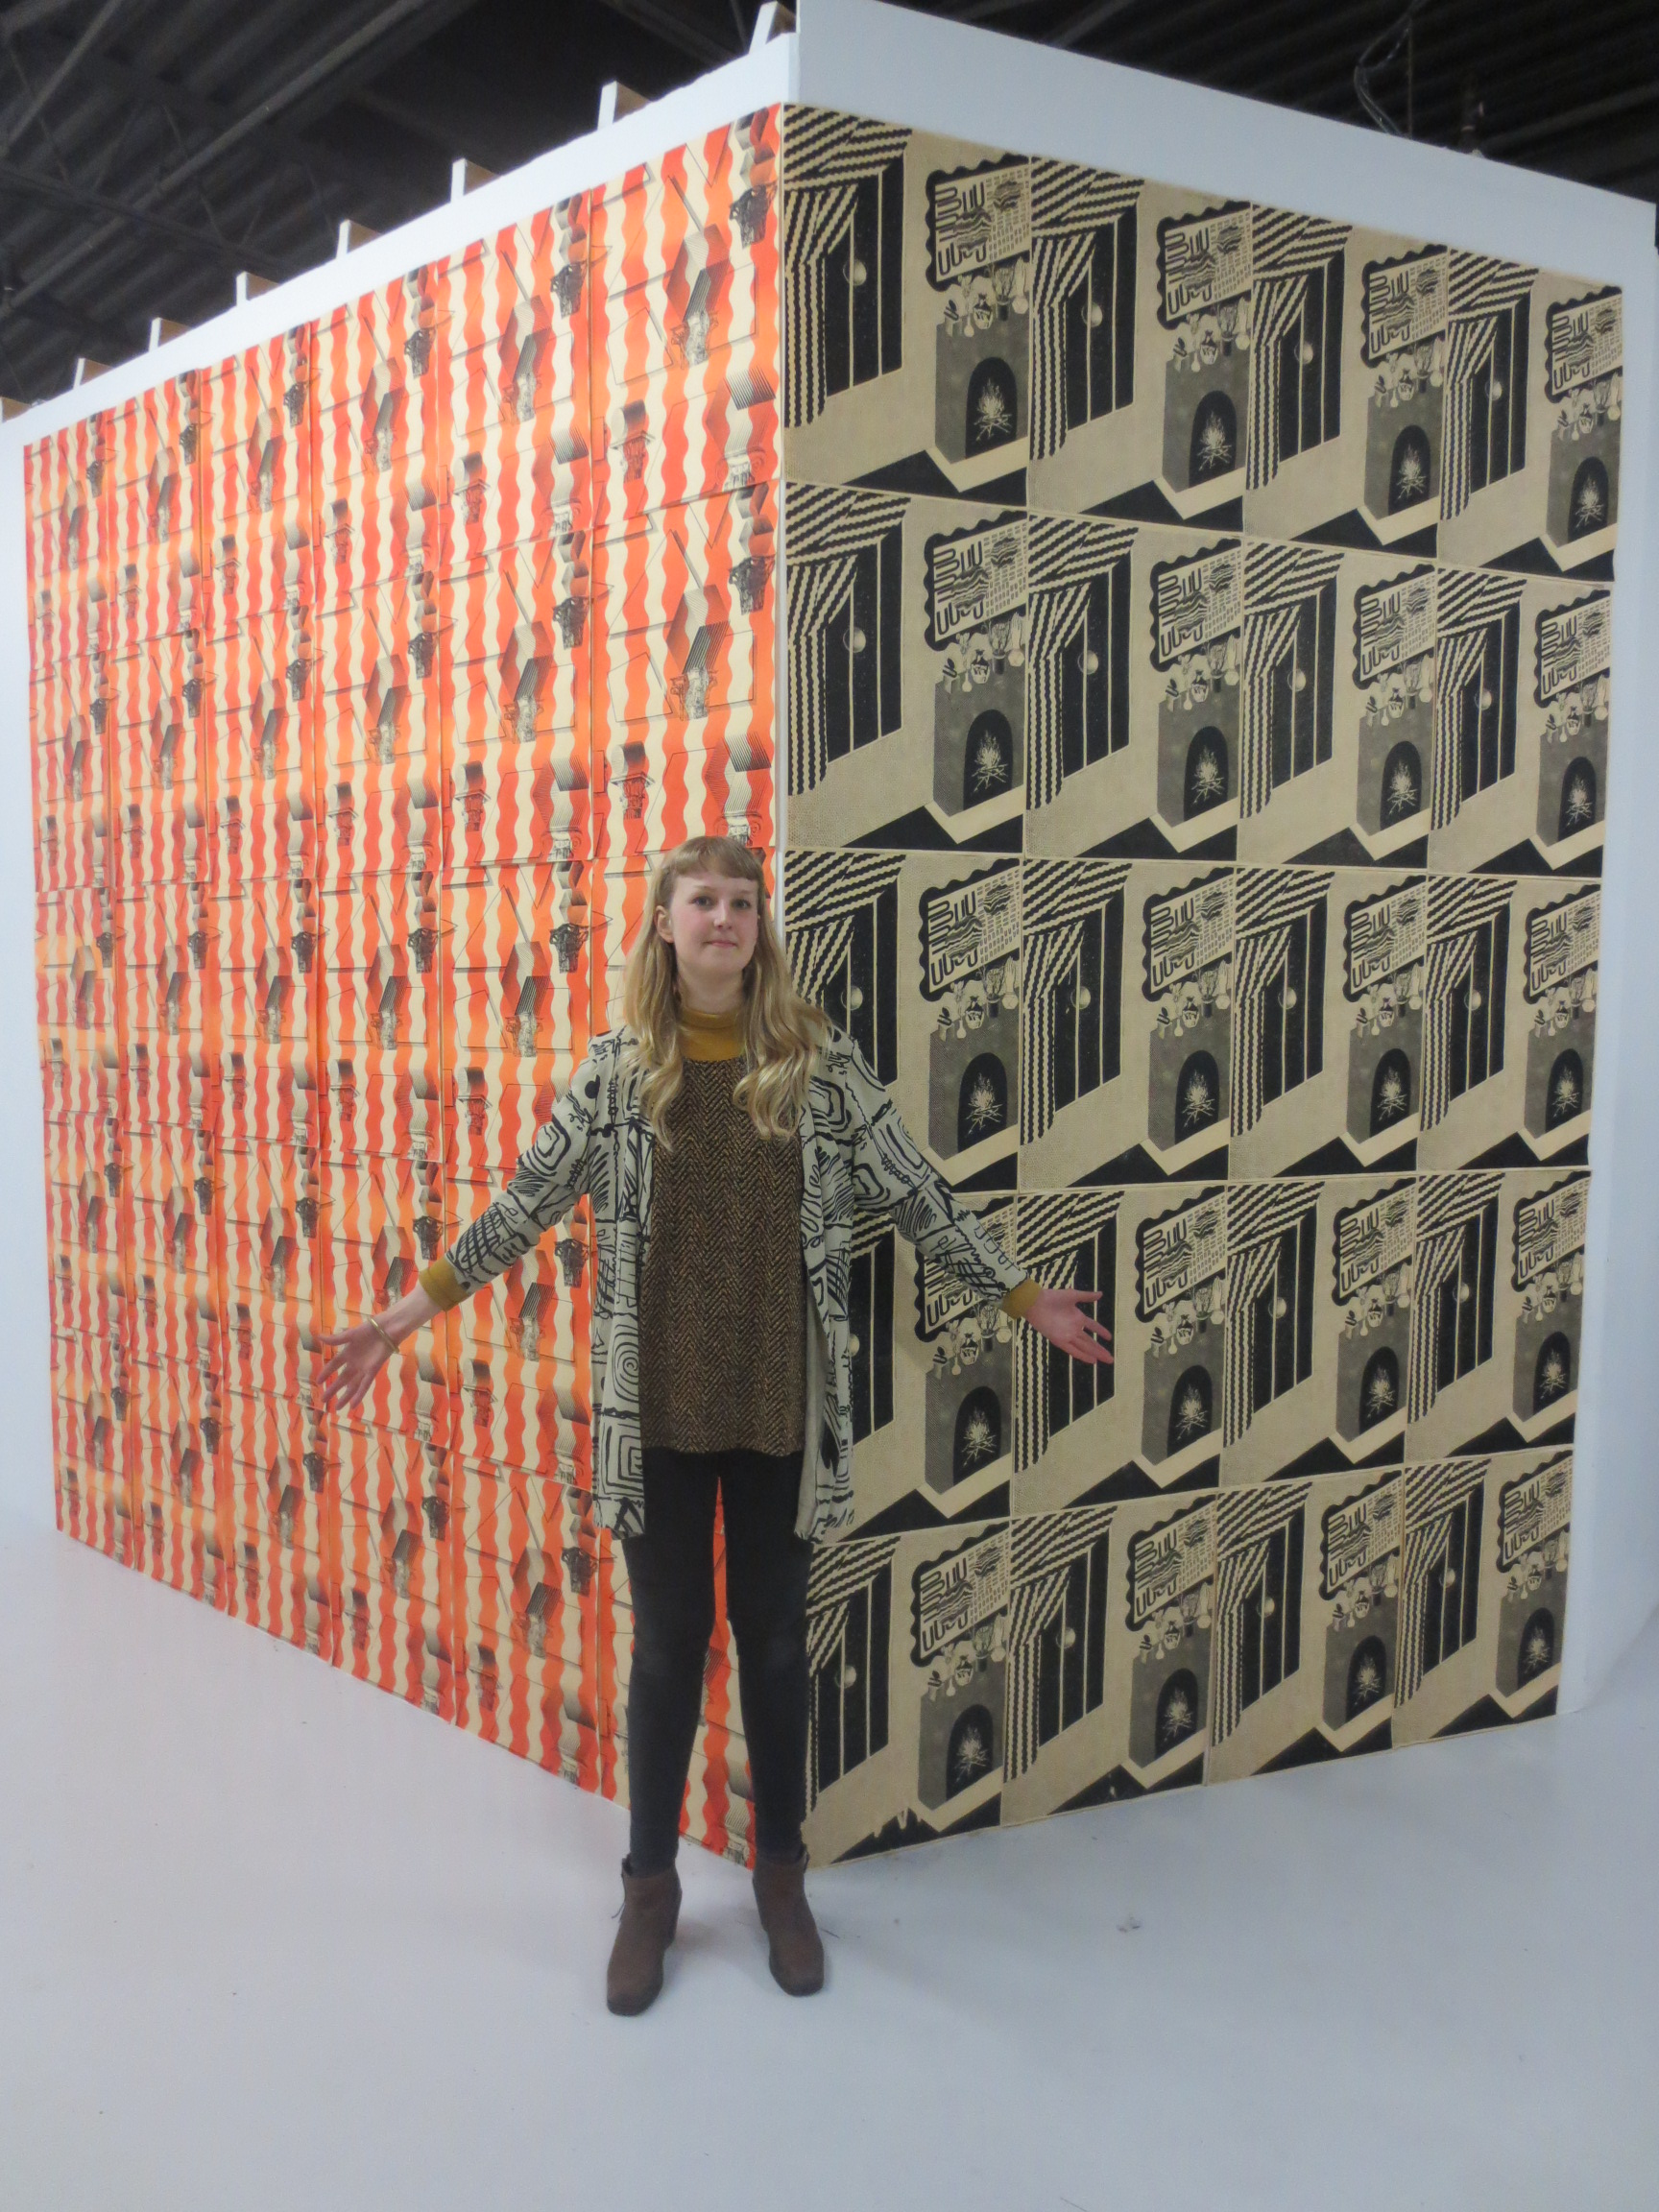 Feast in the East, Toronto  Screenprinted wallpaper installation  2012